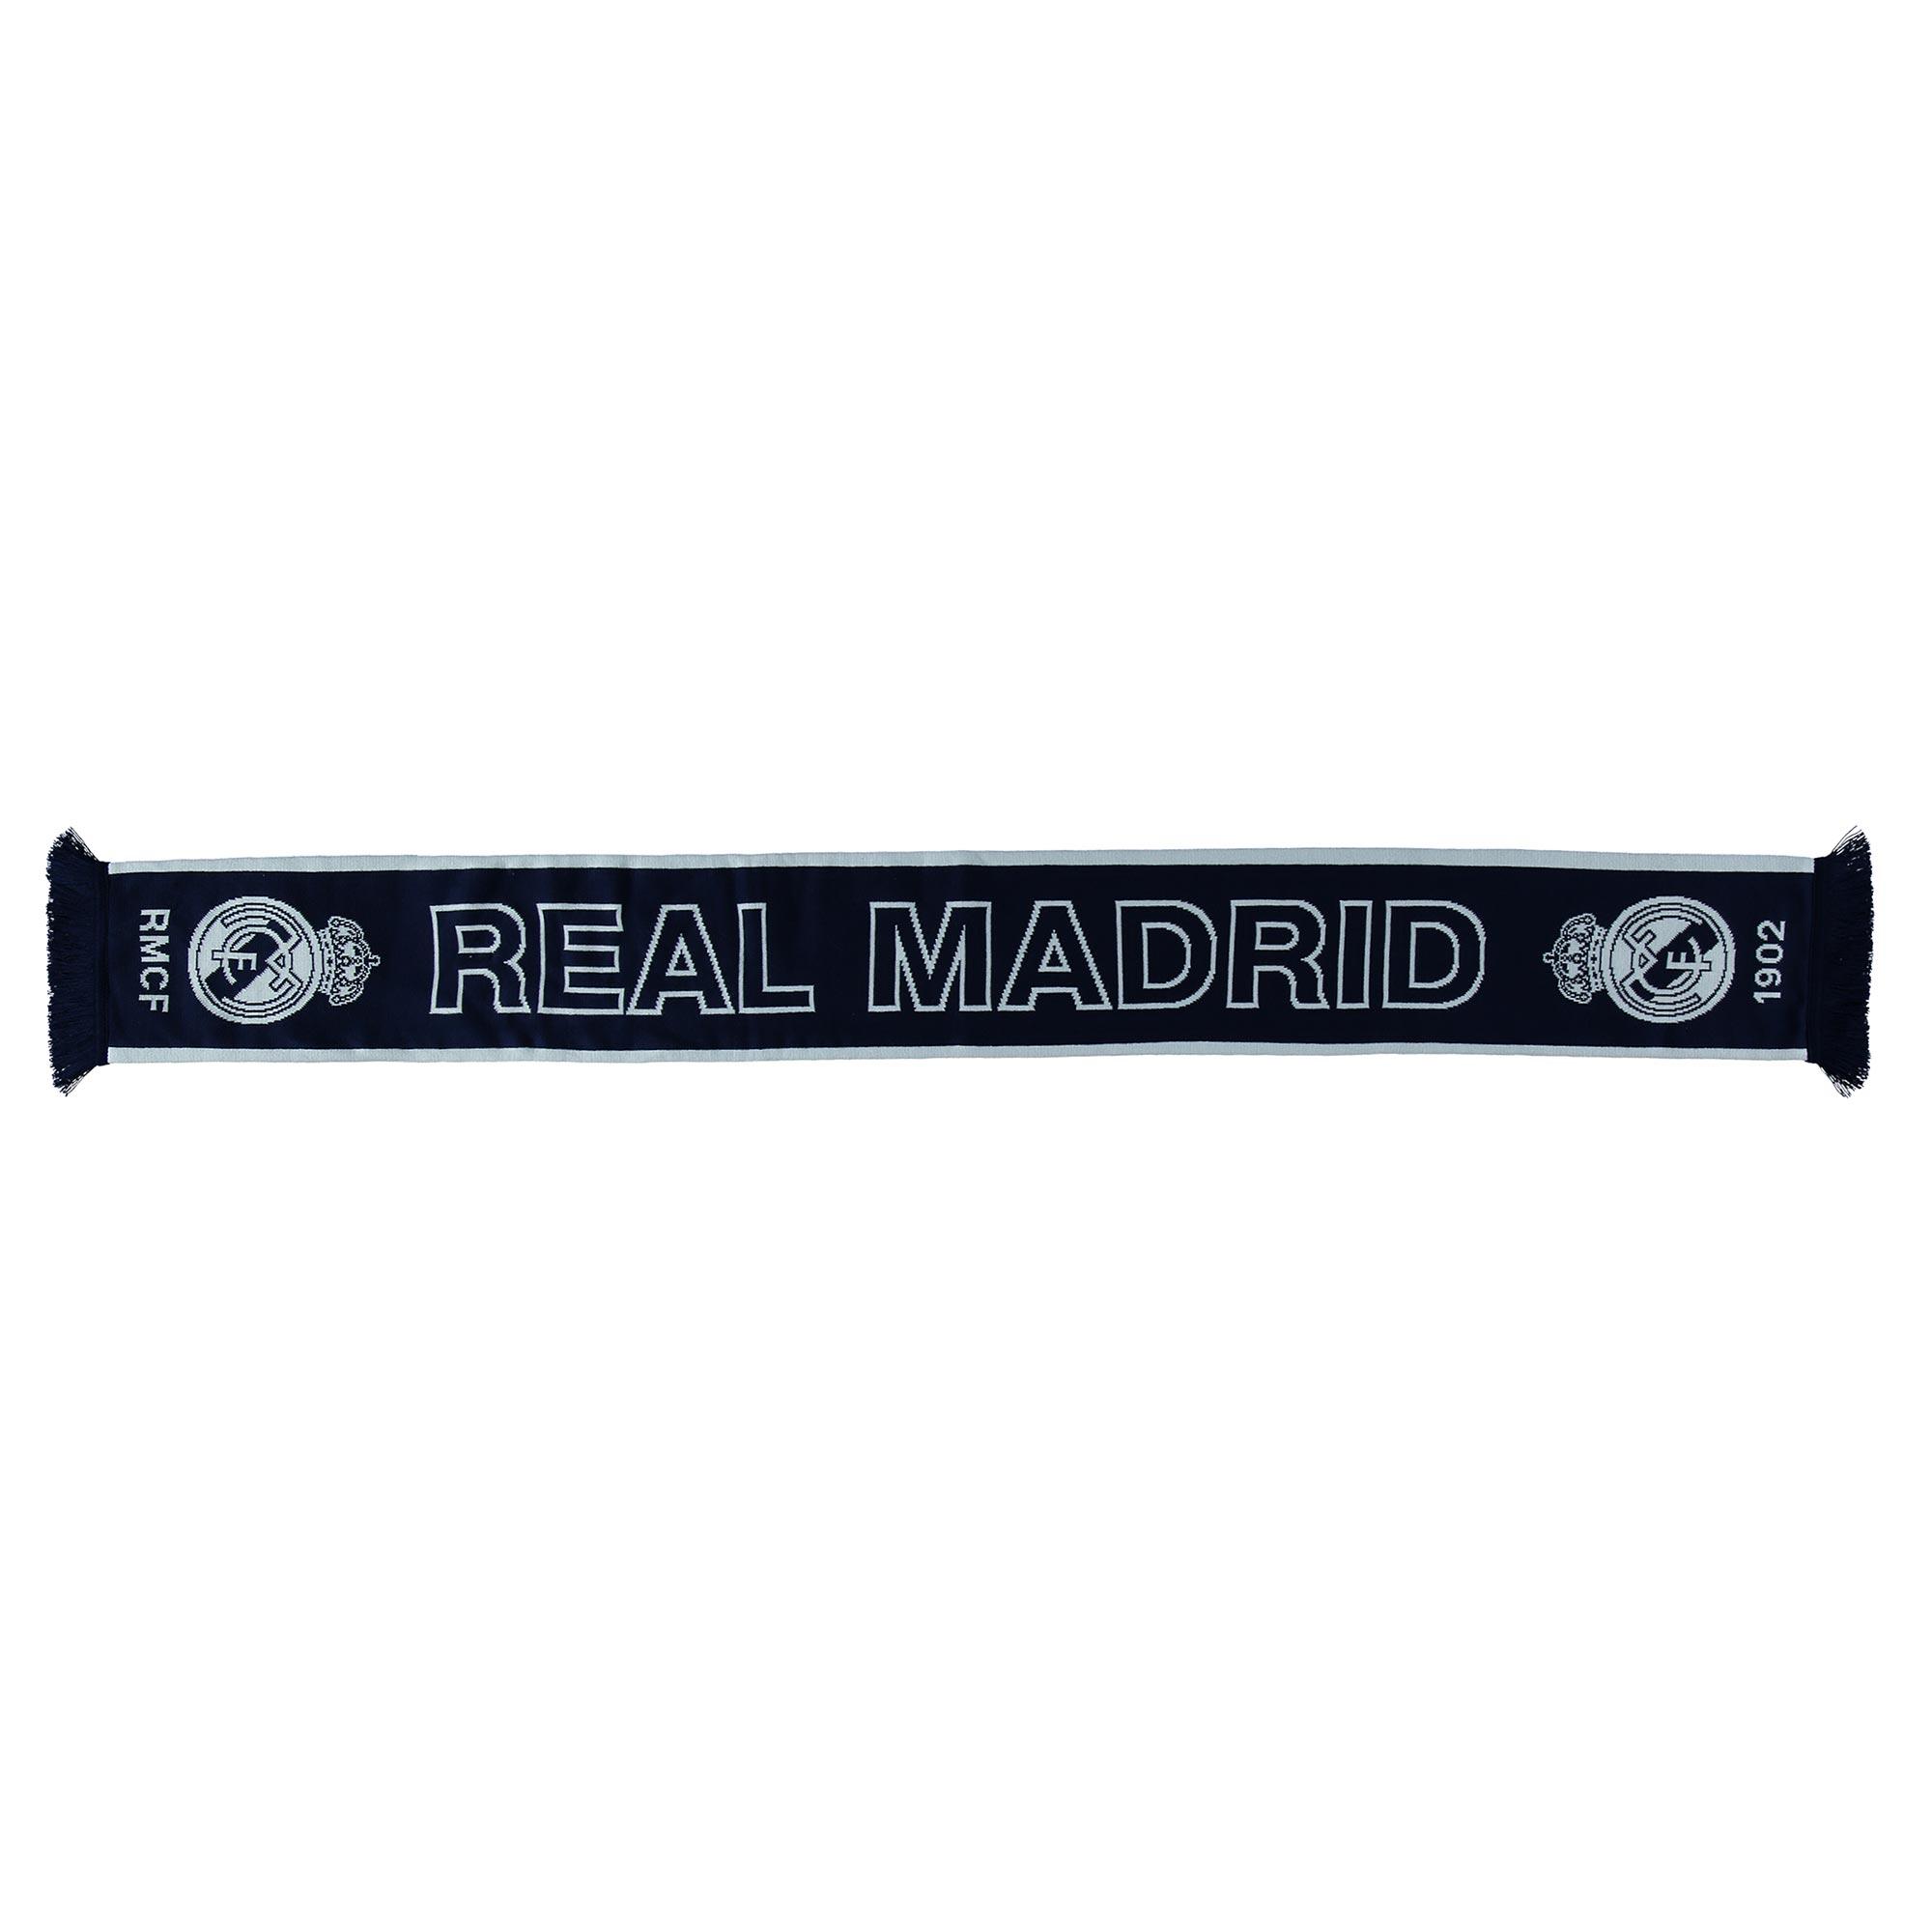 Écharpe de fan Since1902 Real Madrid- Bleu marine- Adulte